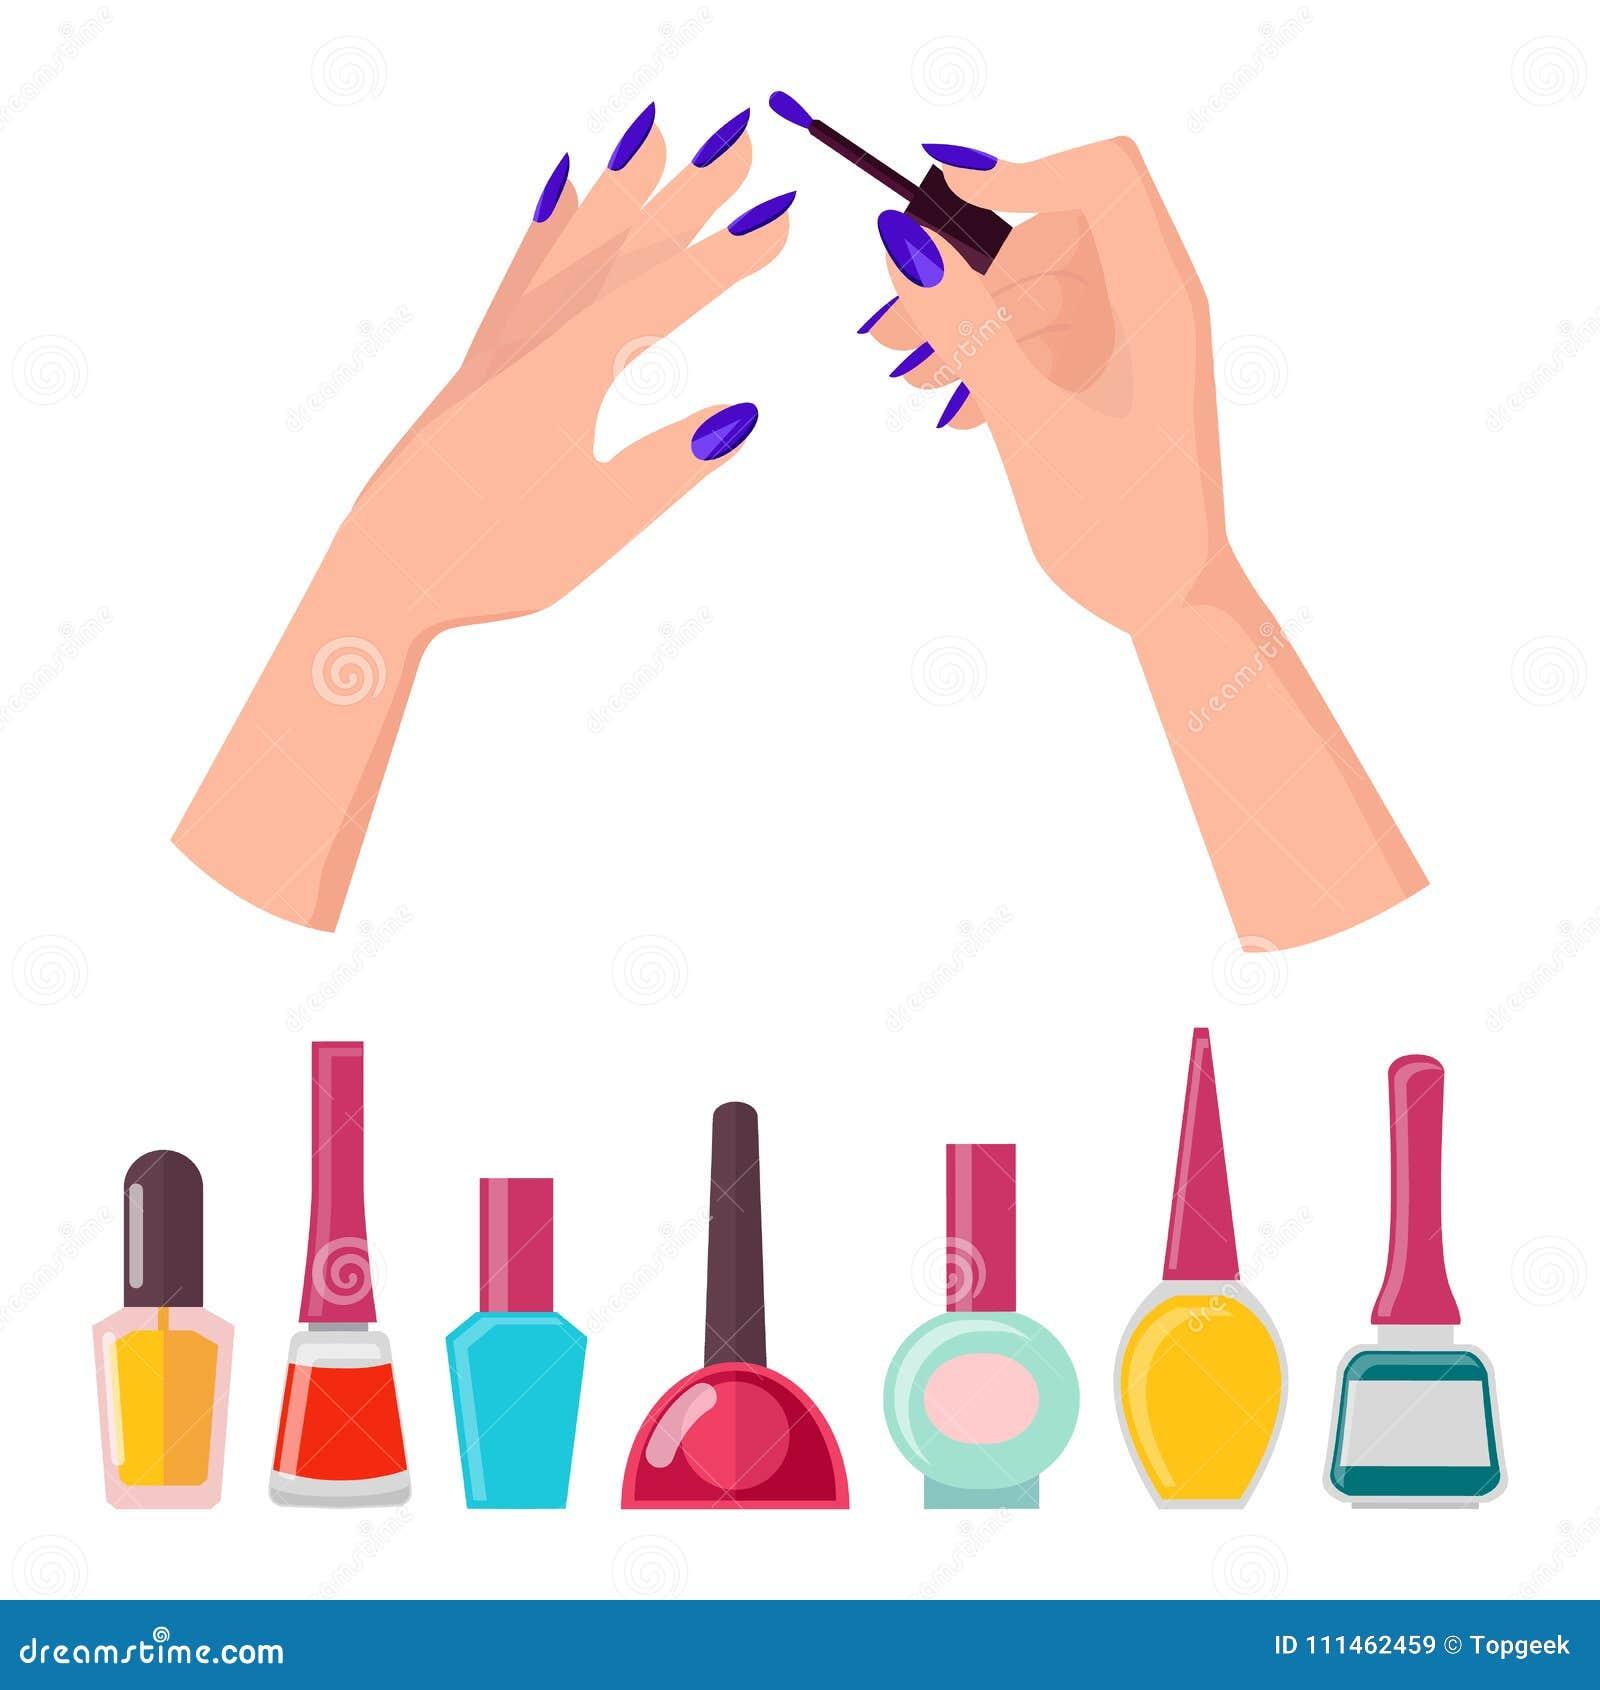 fingernails and polish poster vector illustration stock vector